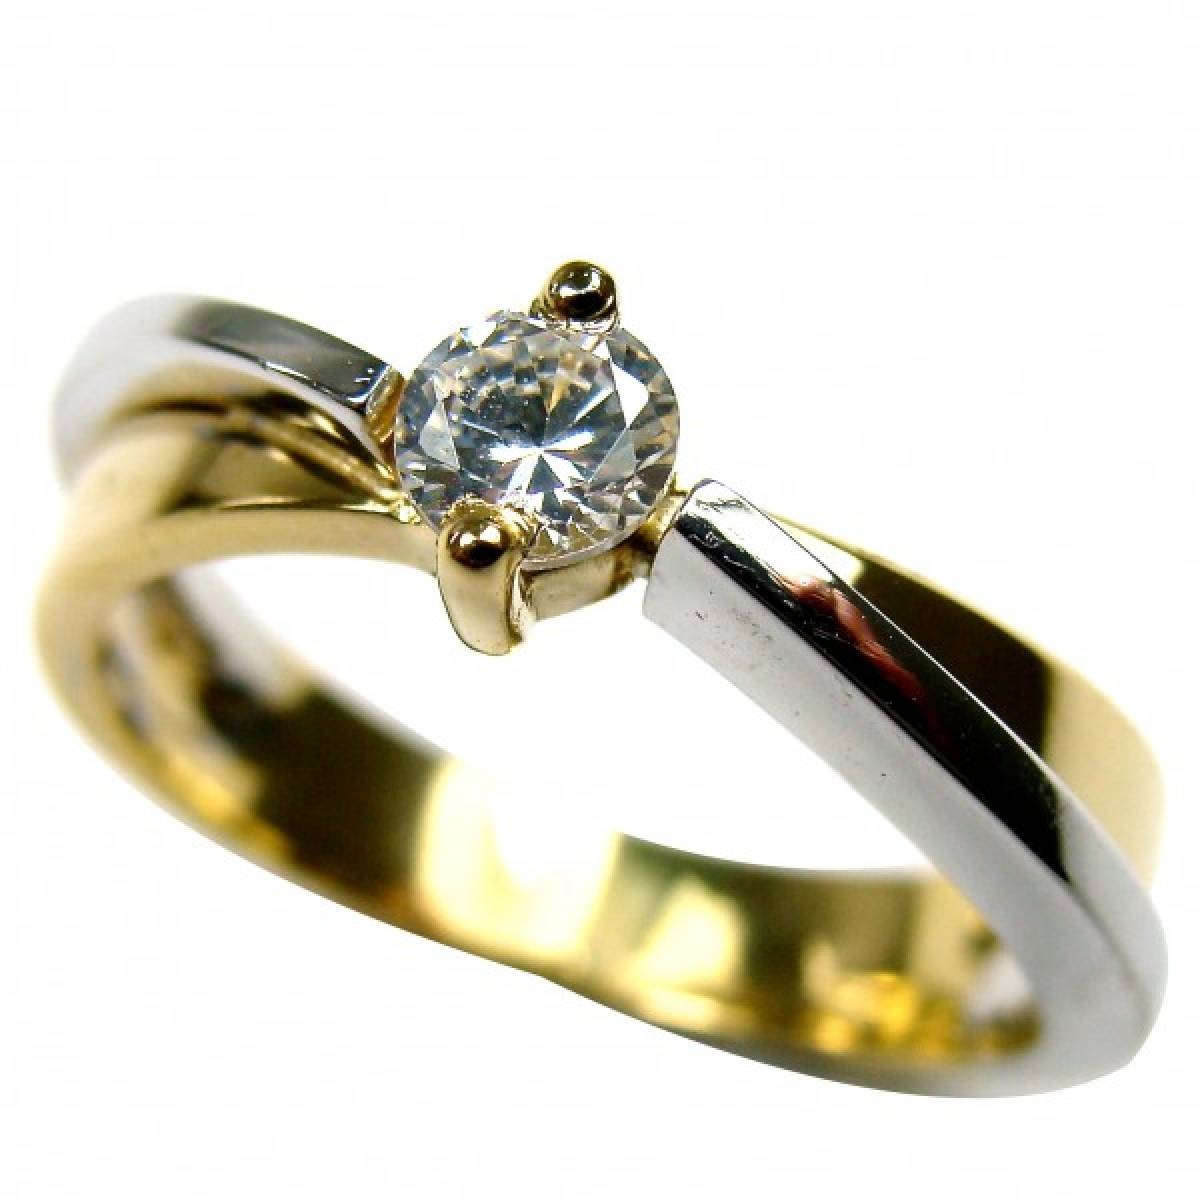 Anel de Noivado Ouro Branco e Amarelo com Diamante ou Zircónia